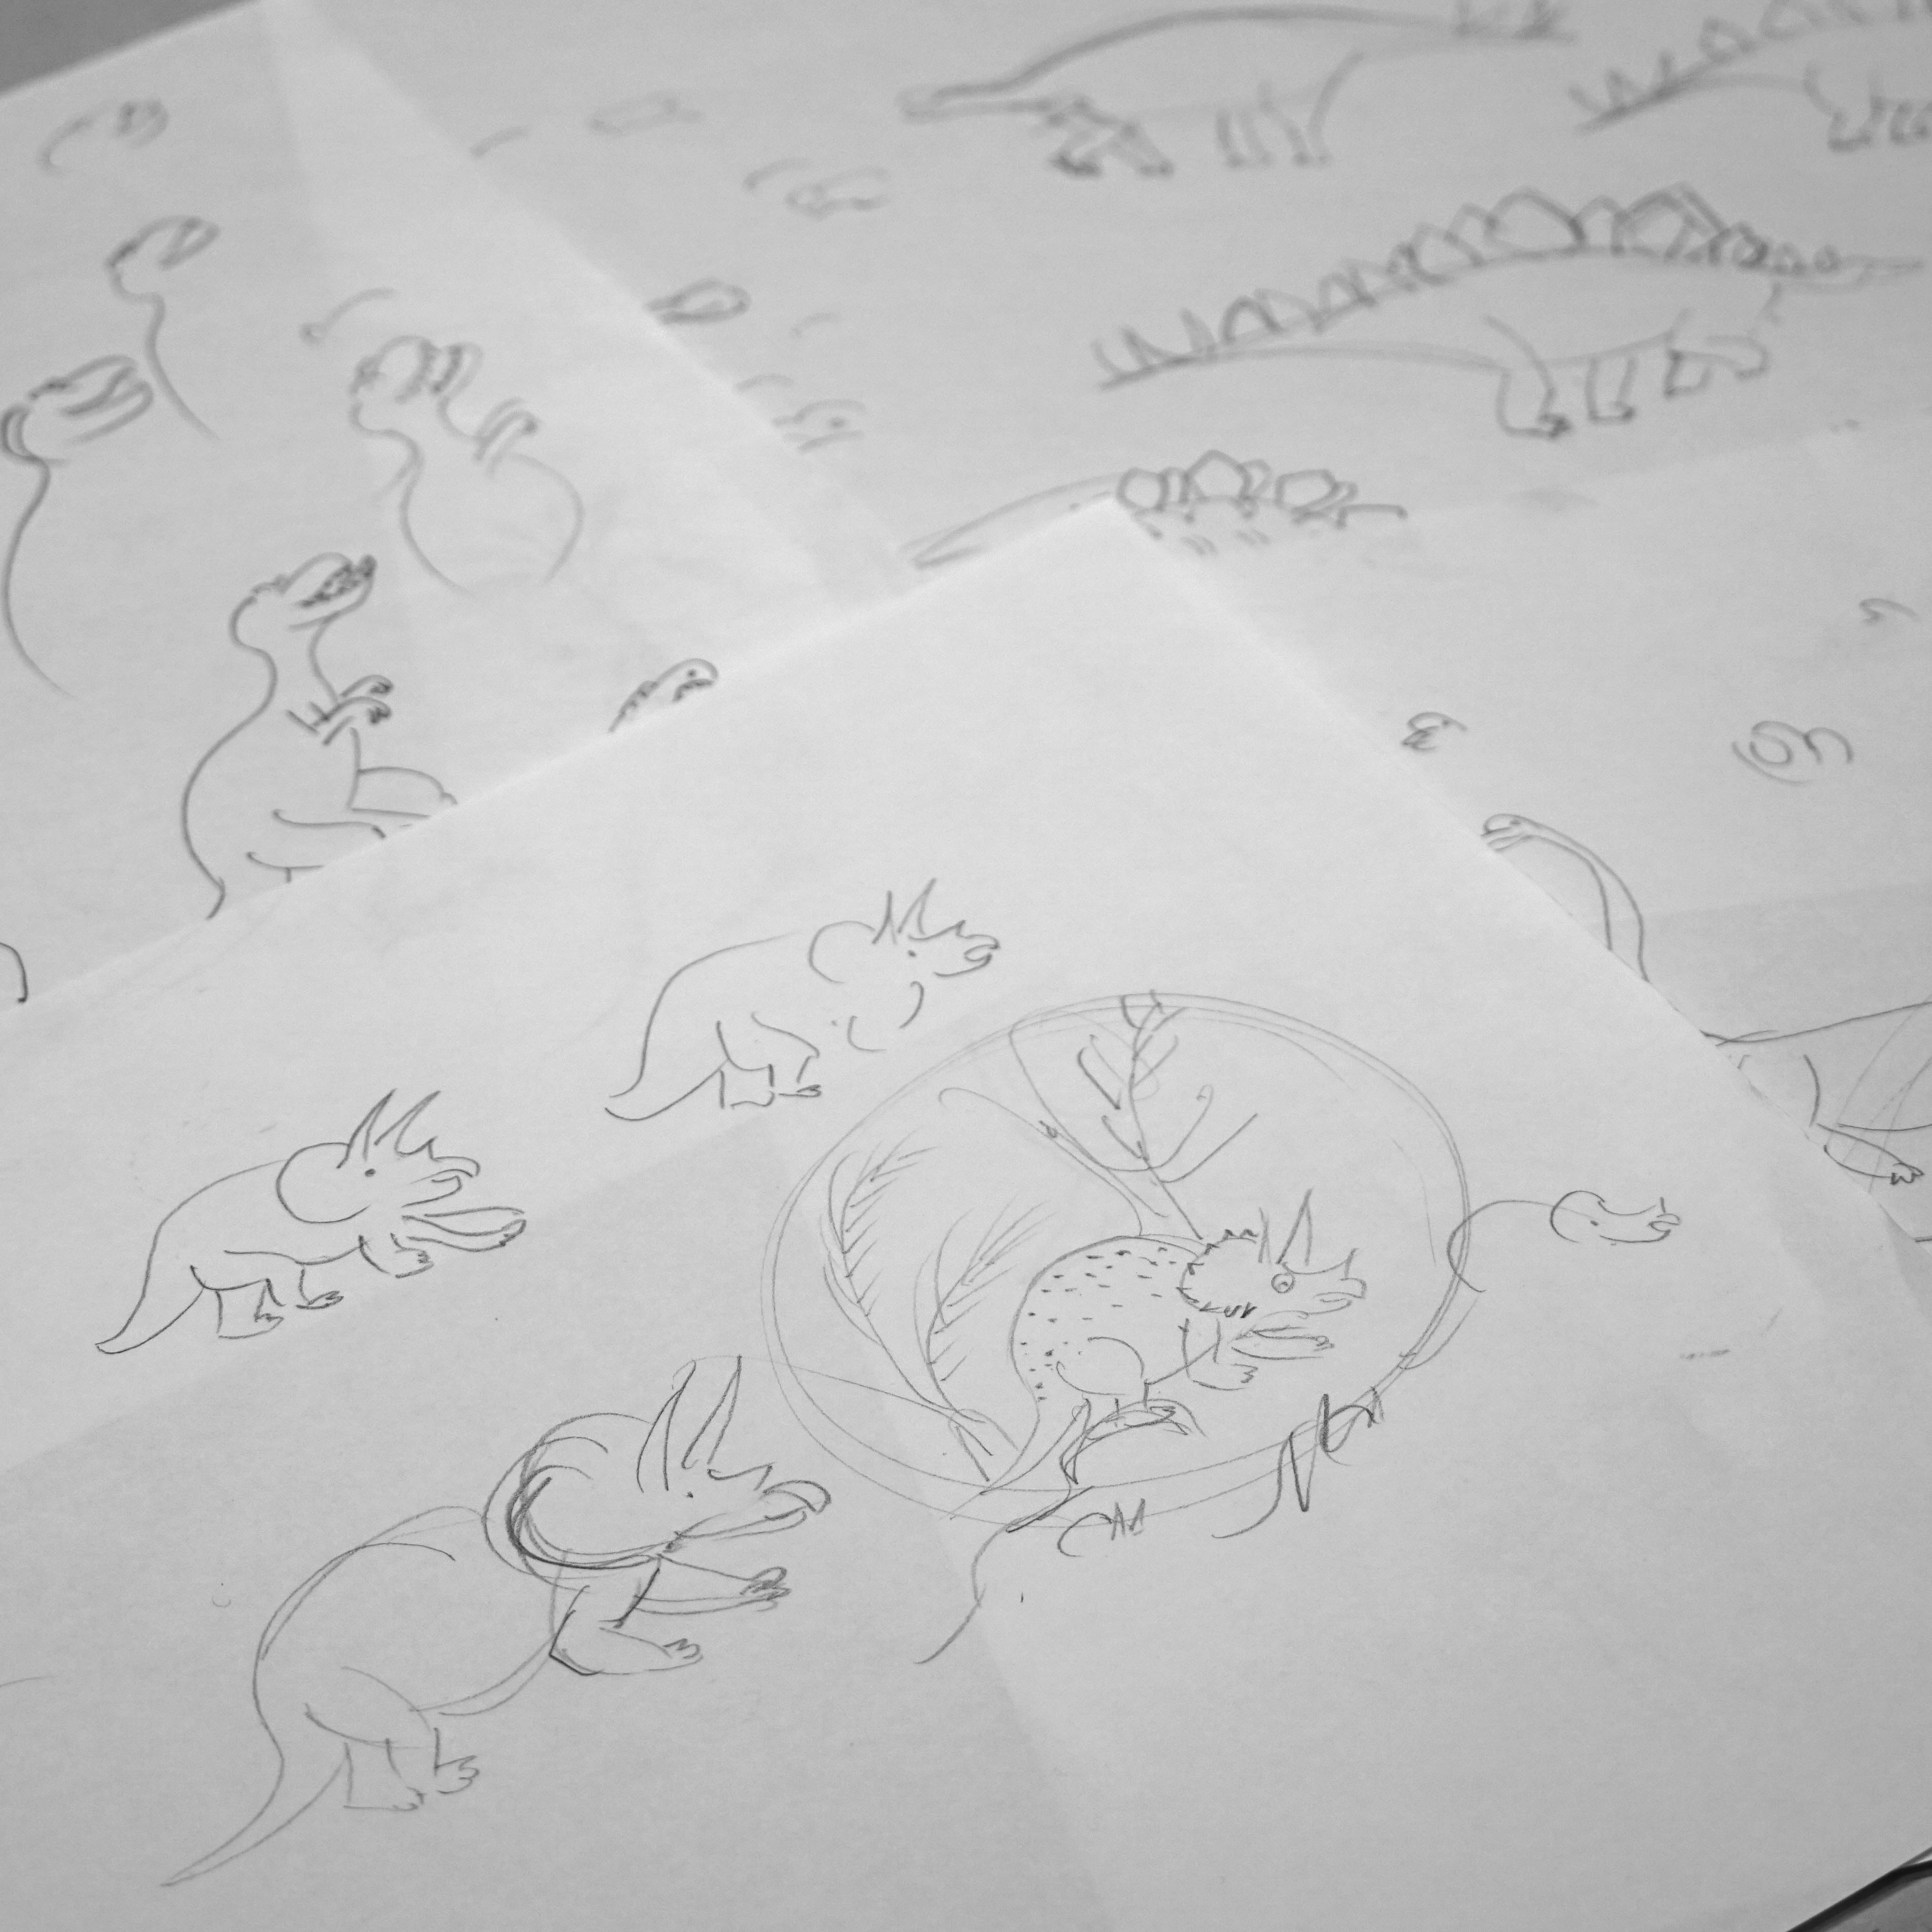 FAQ 1 「恐竜が好きですか?」by Mirjam